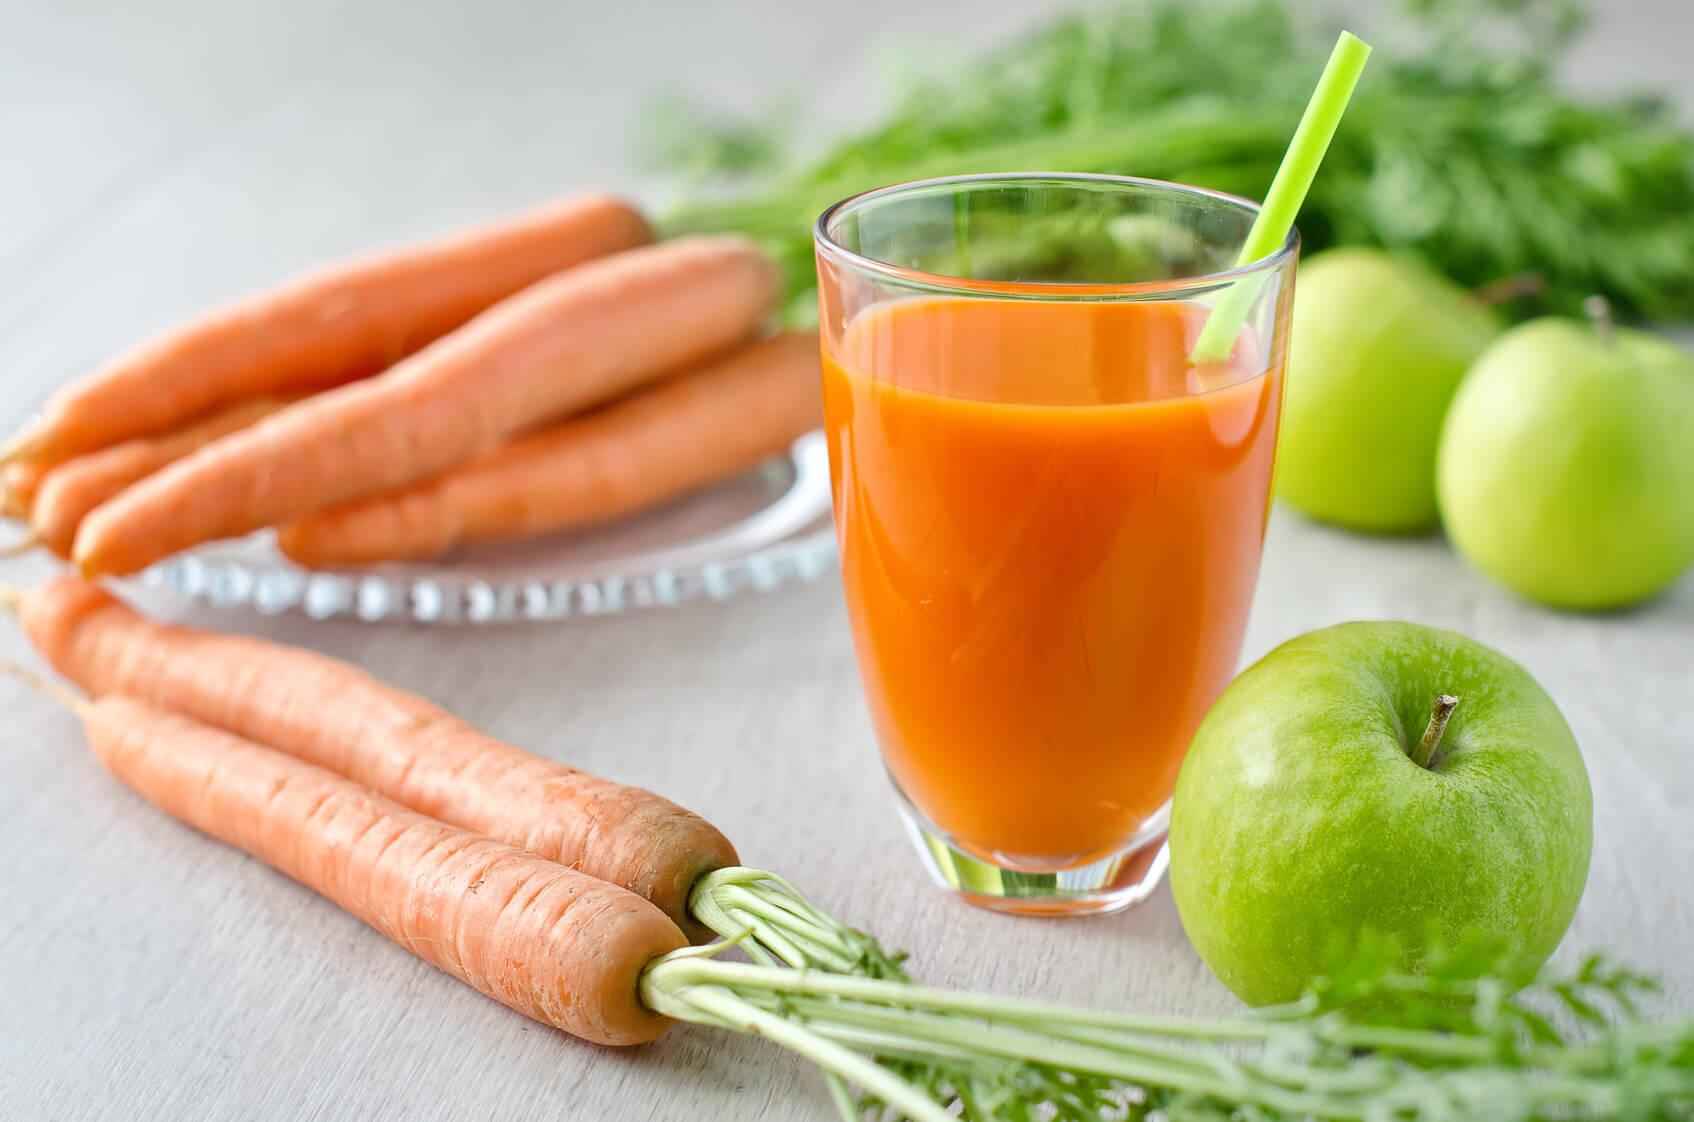 Jugo natural de zanahoria, apio y manzana.